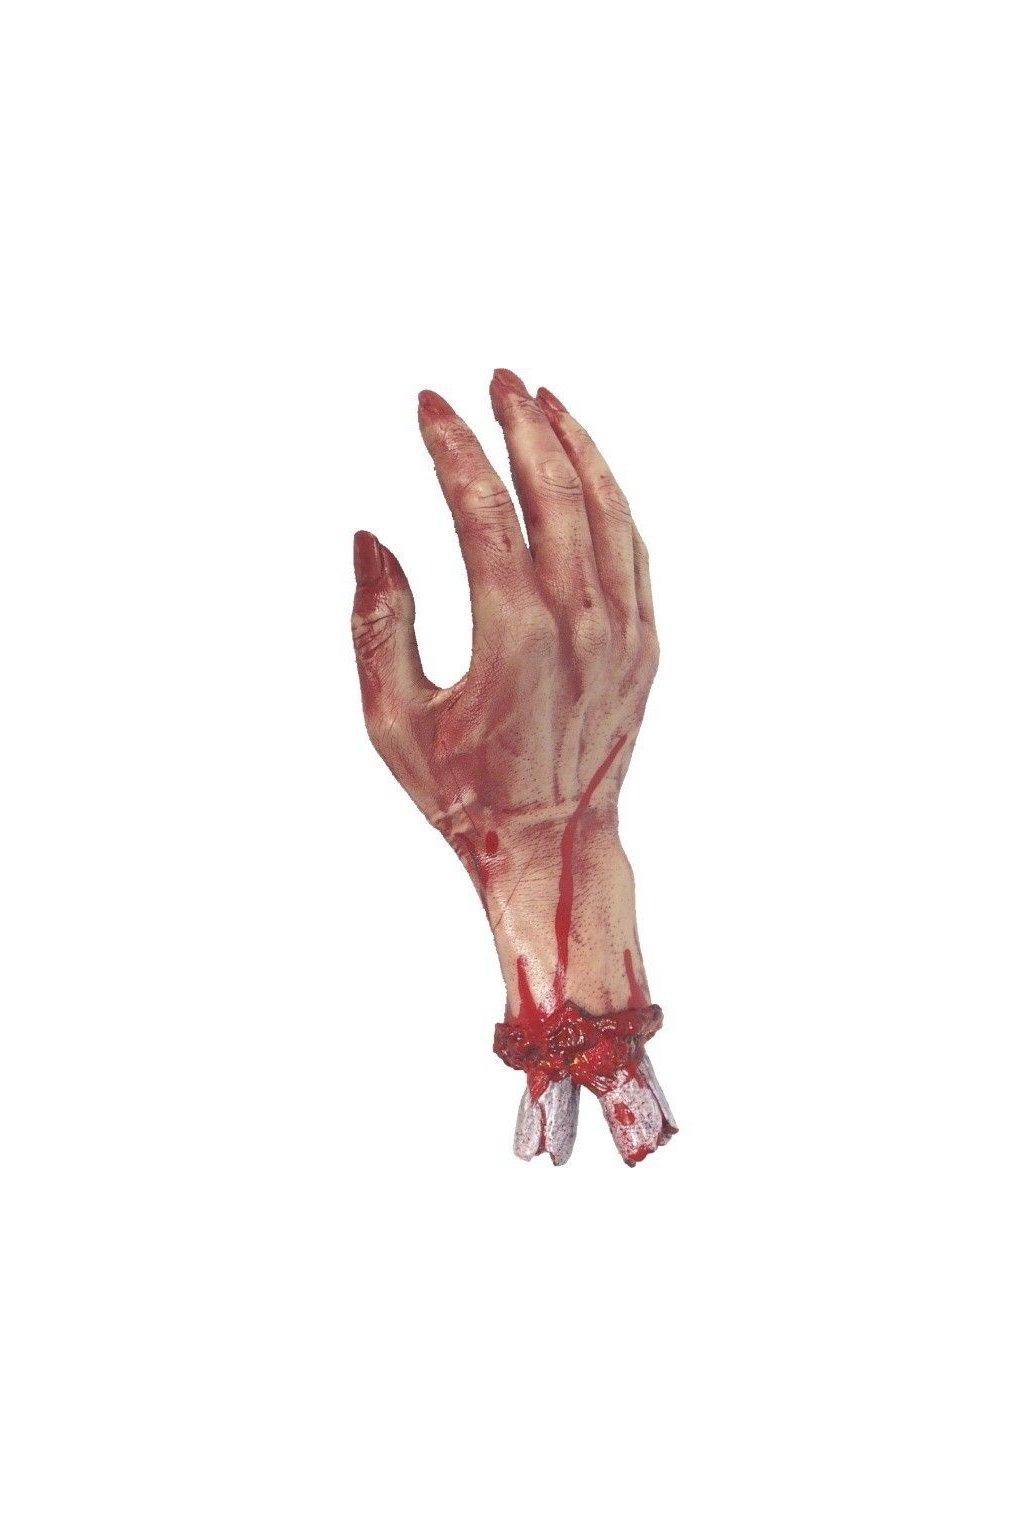 Krvavá ruka realistická